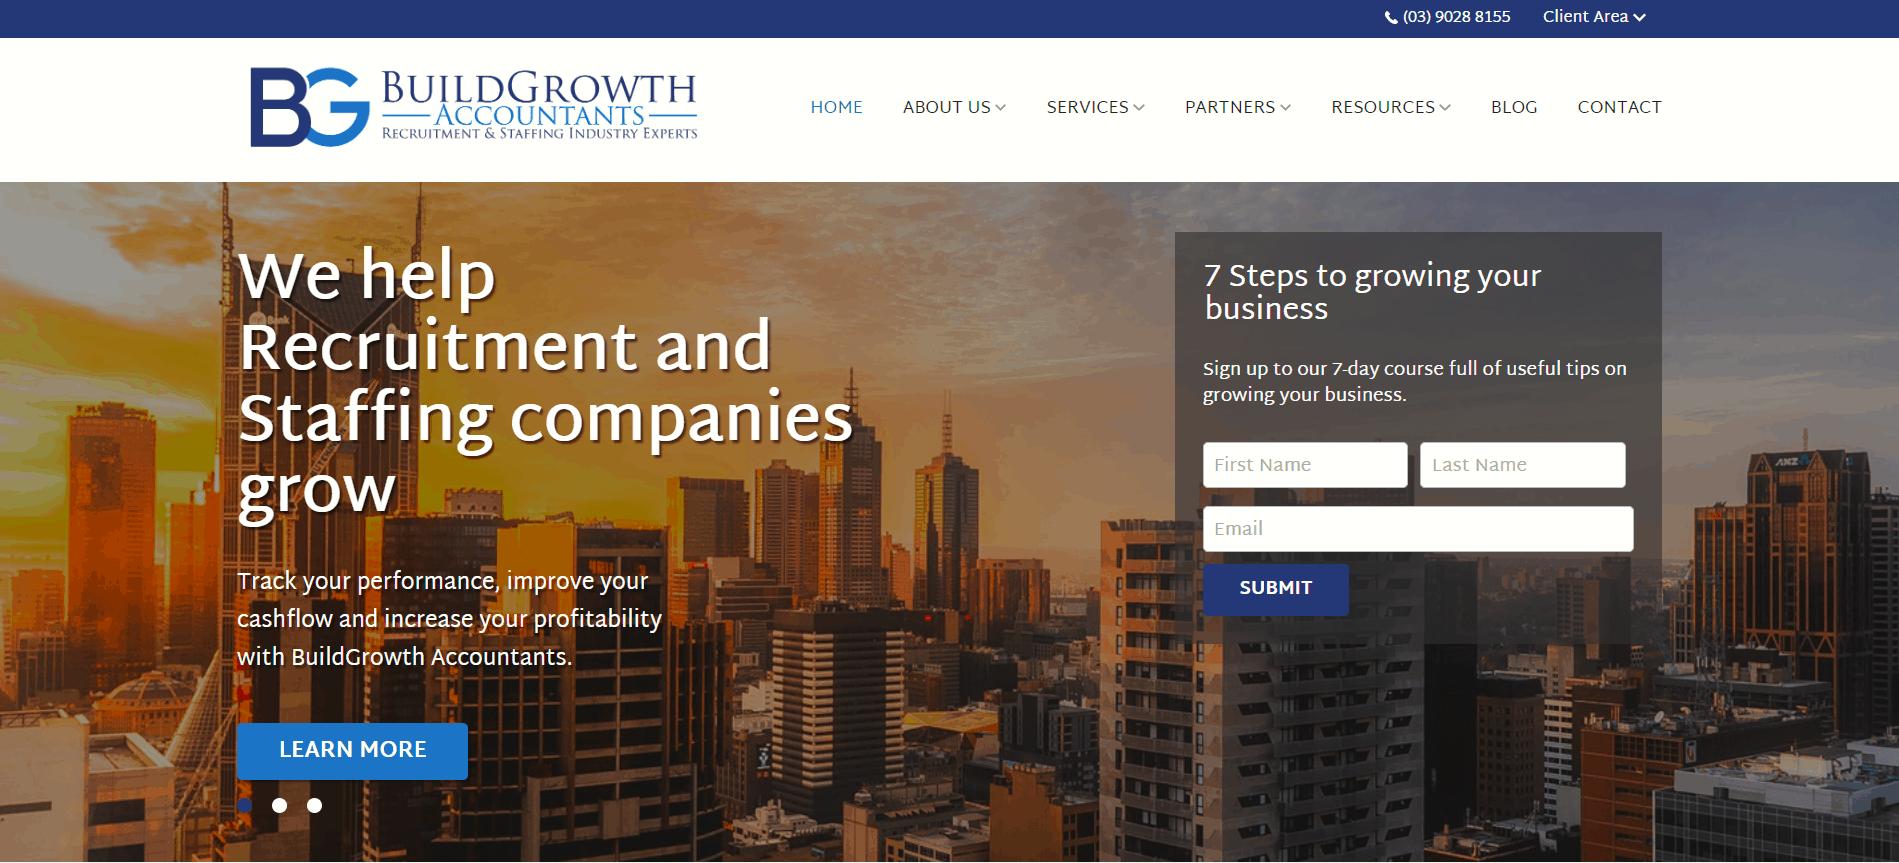 Buildgrowth Accountants